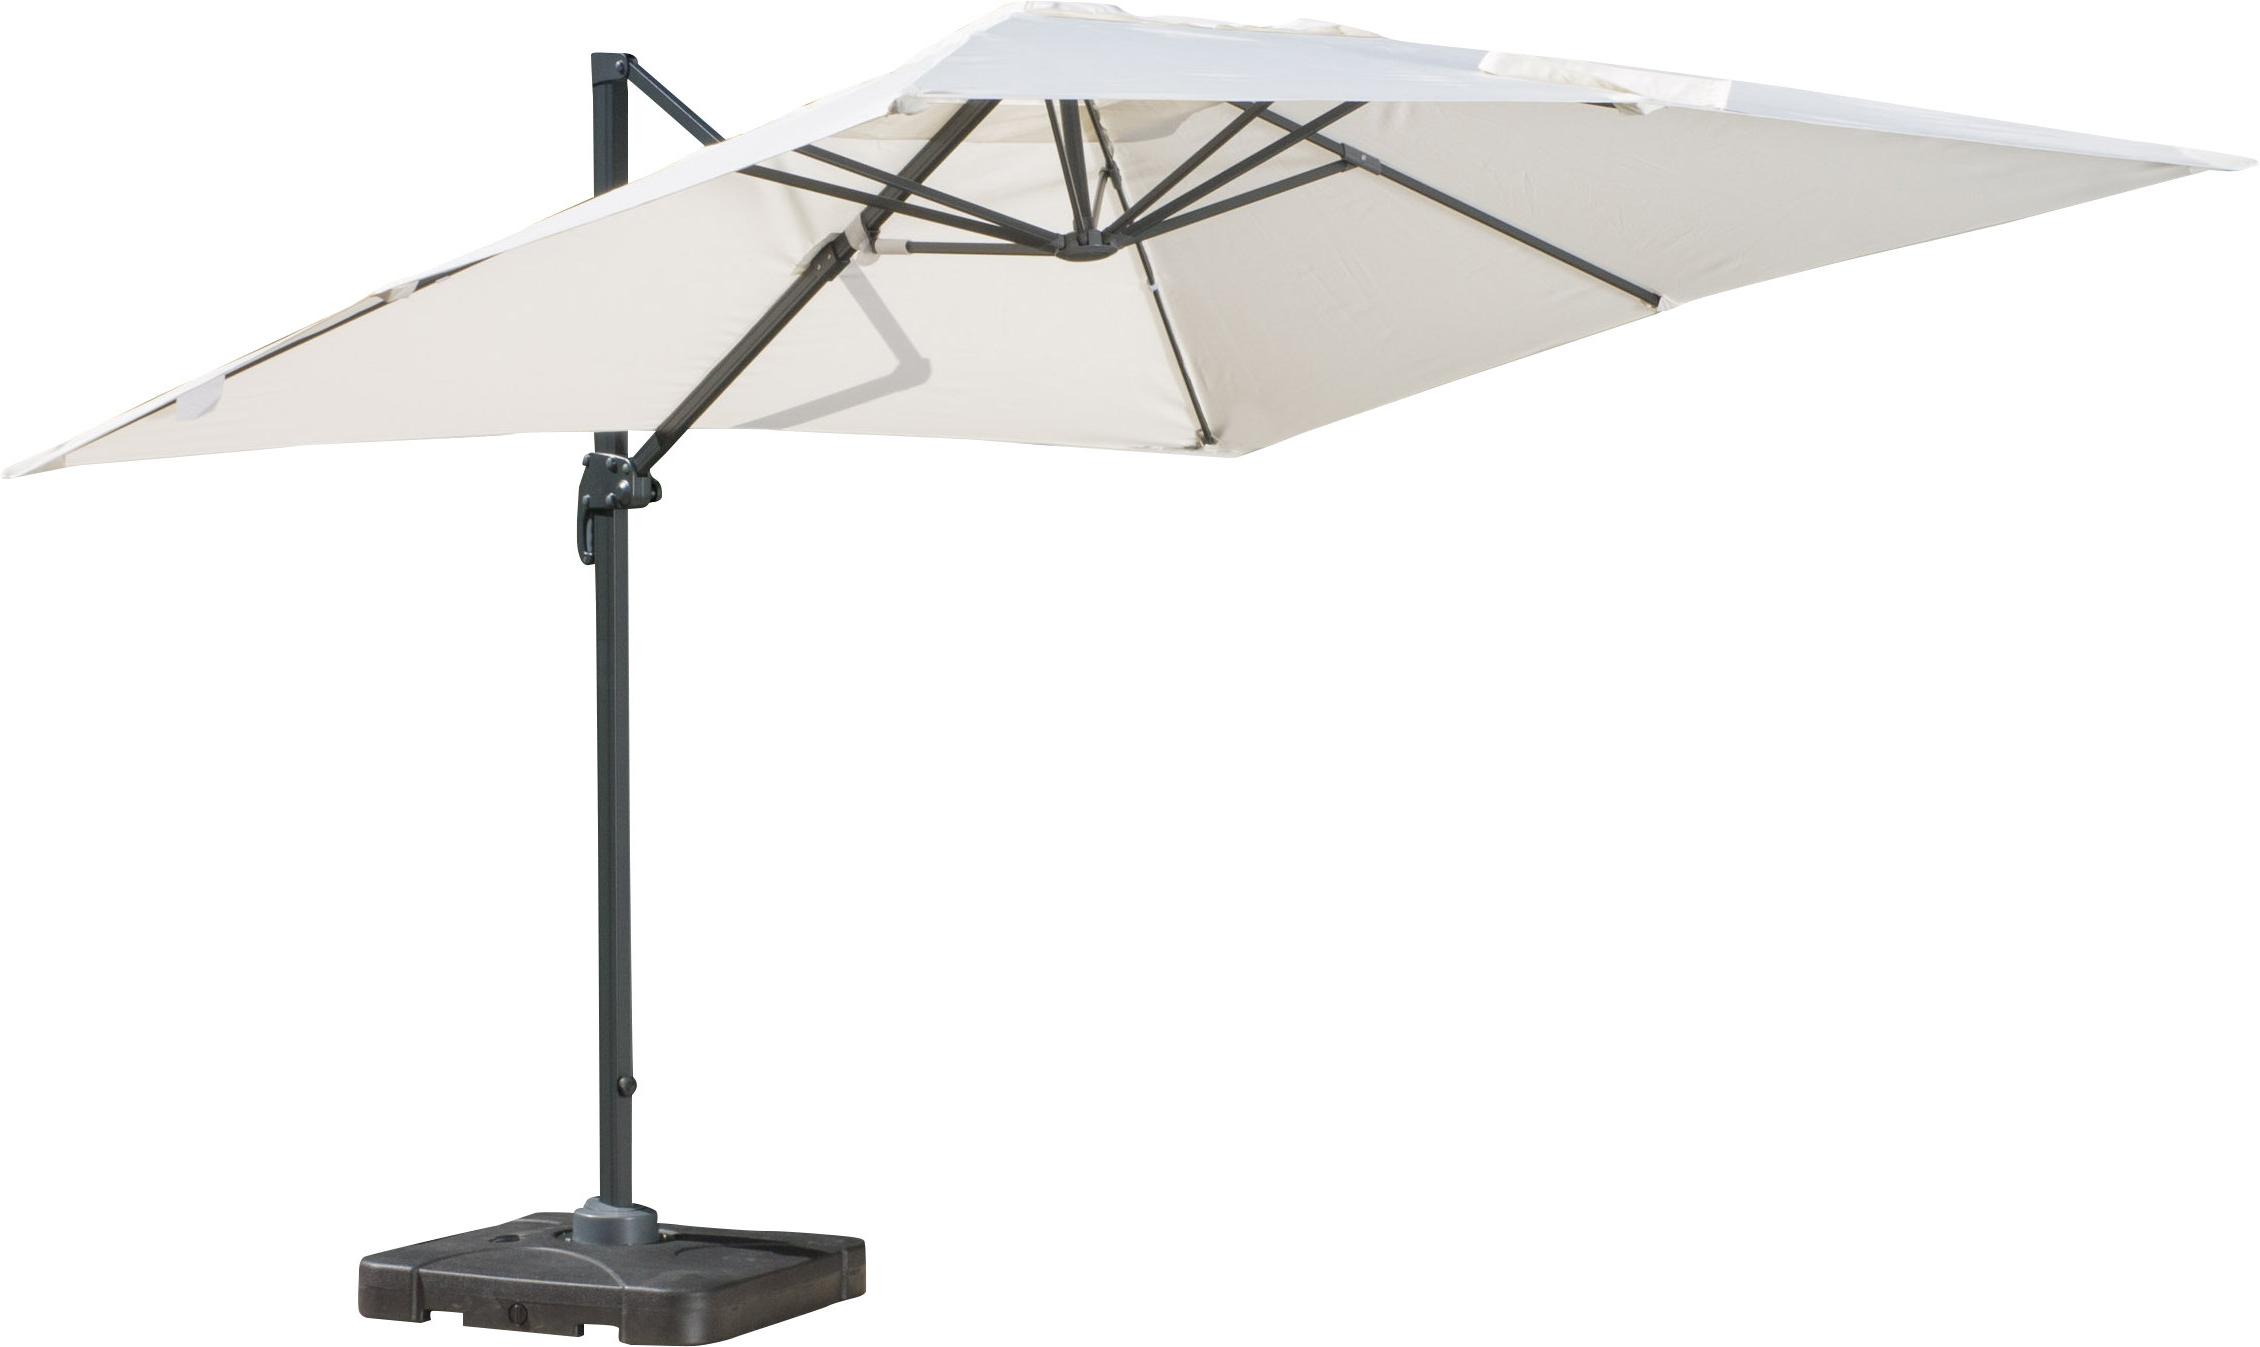 Recent Carlisle Square Cantilever Sunbrella Umbrellas For Boracay 10' Square Cantilever Umbrella (Gallery 11 of 20)